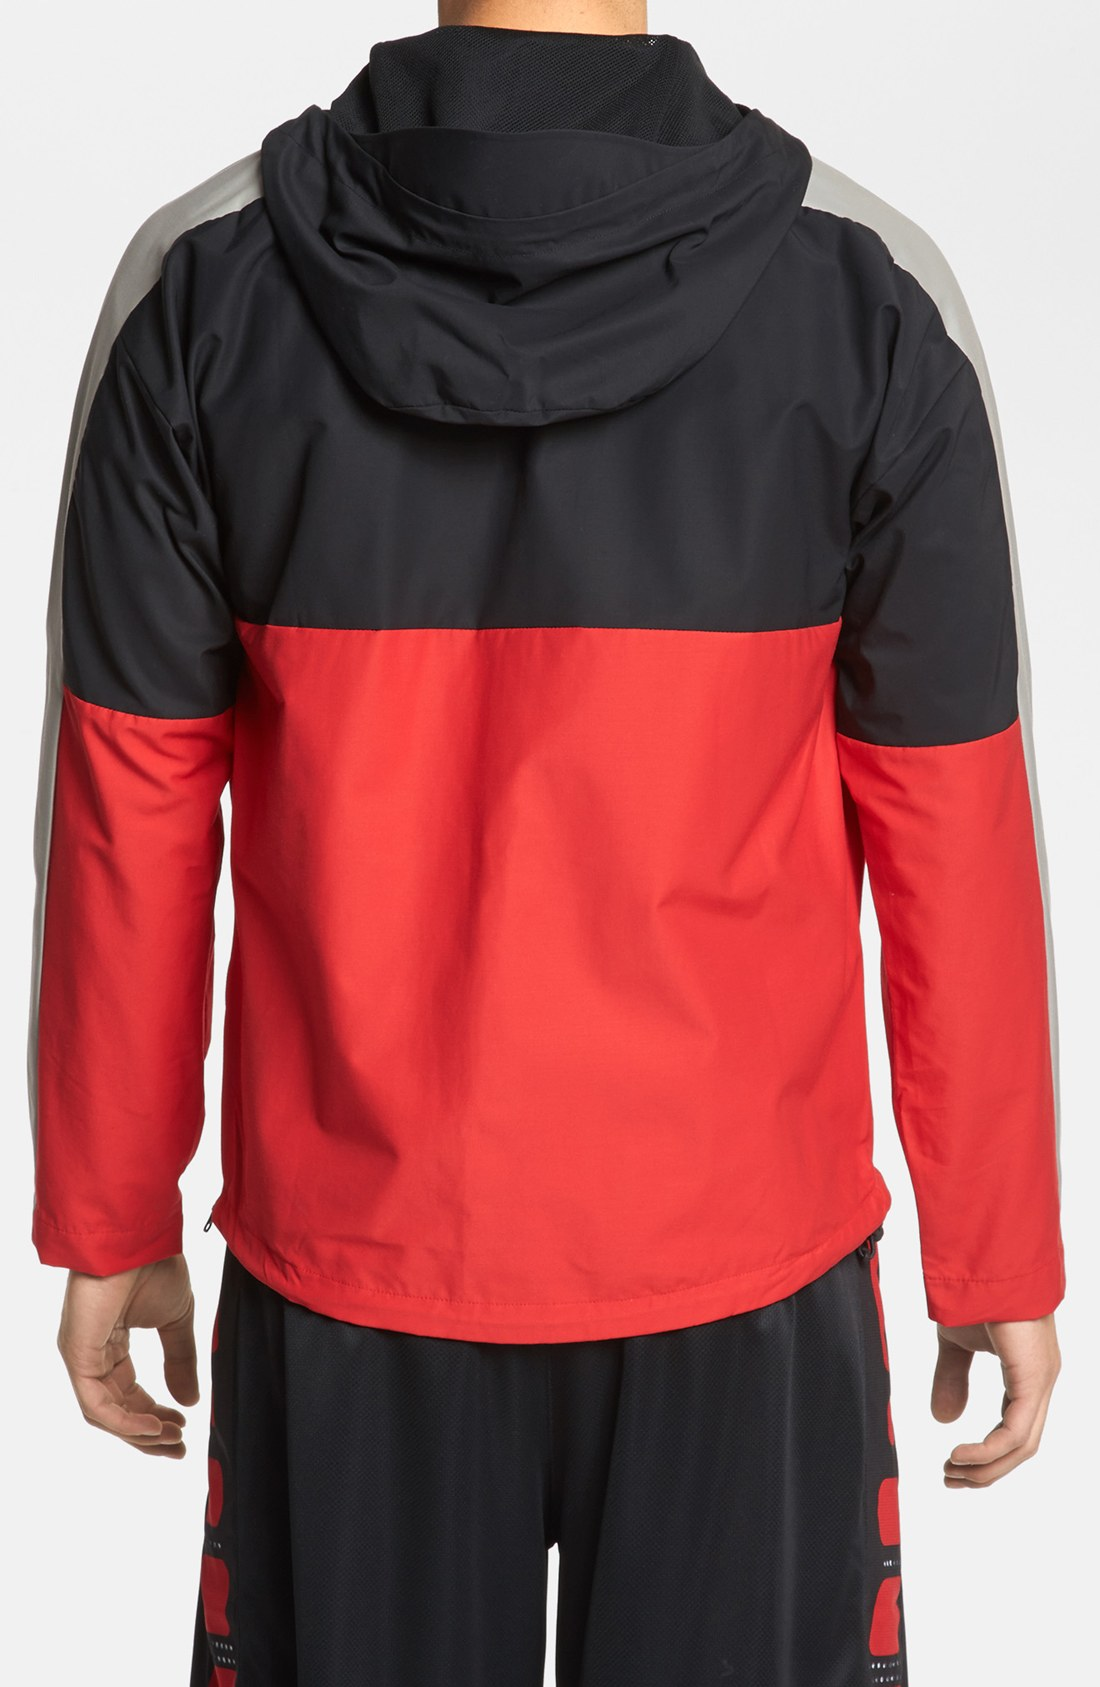 nike heritage air half zip jacket in red for men lyst. Black Bedroom Furniture Sets. Home Design Ideas